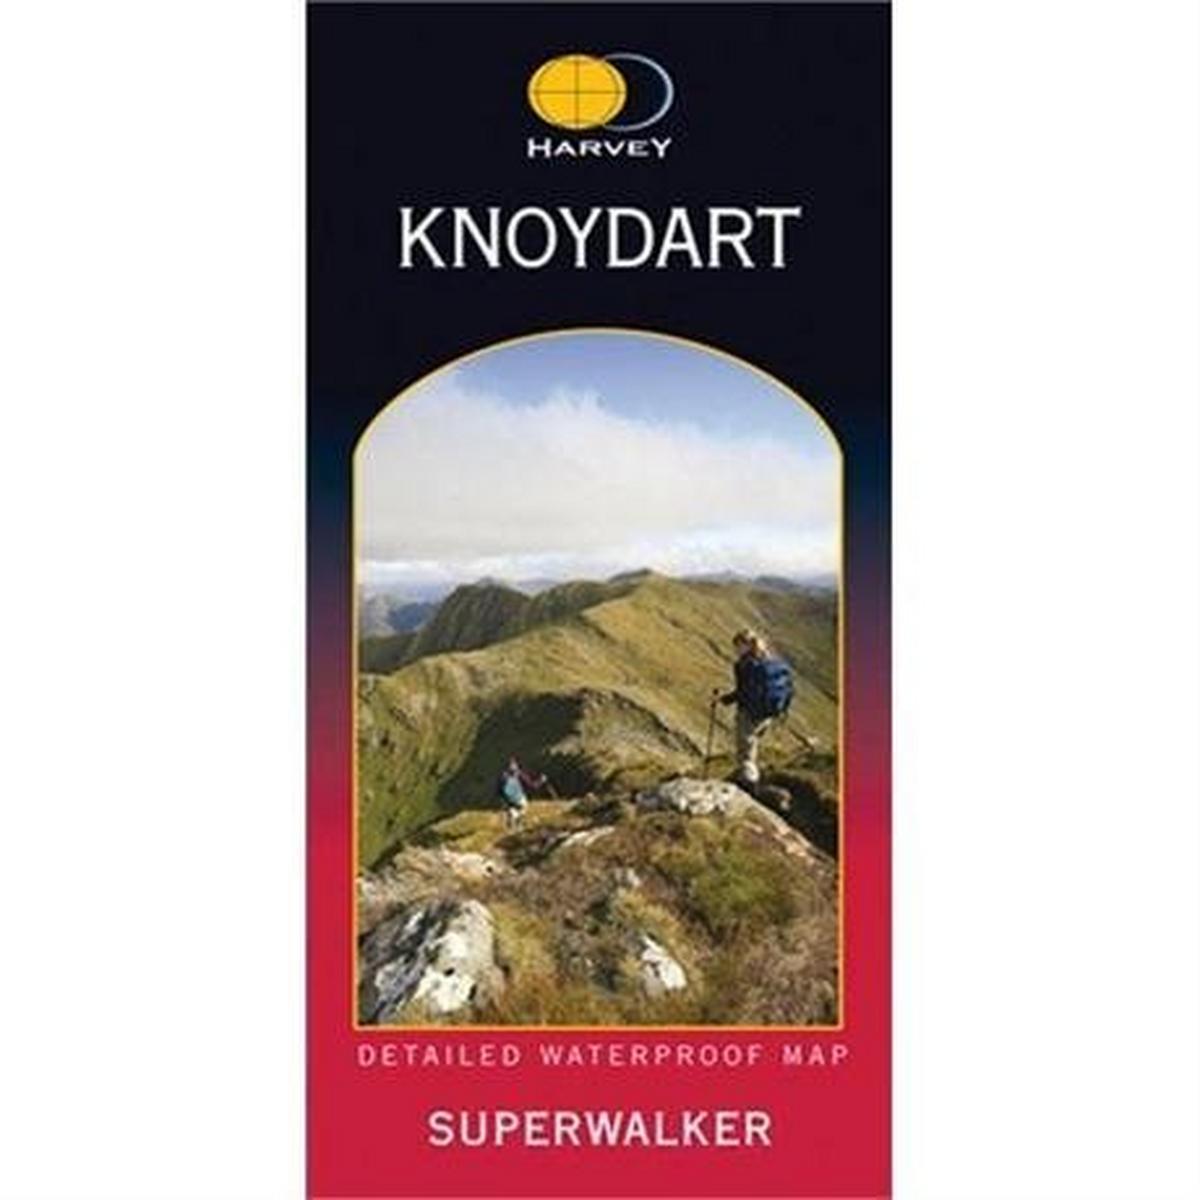 Harveys Harvey Map - Superwalker: Knoydart